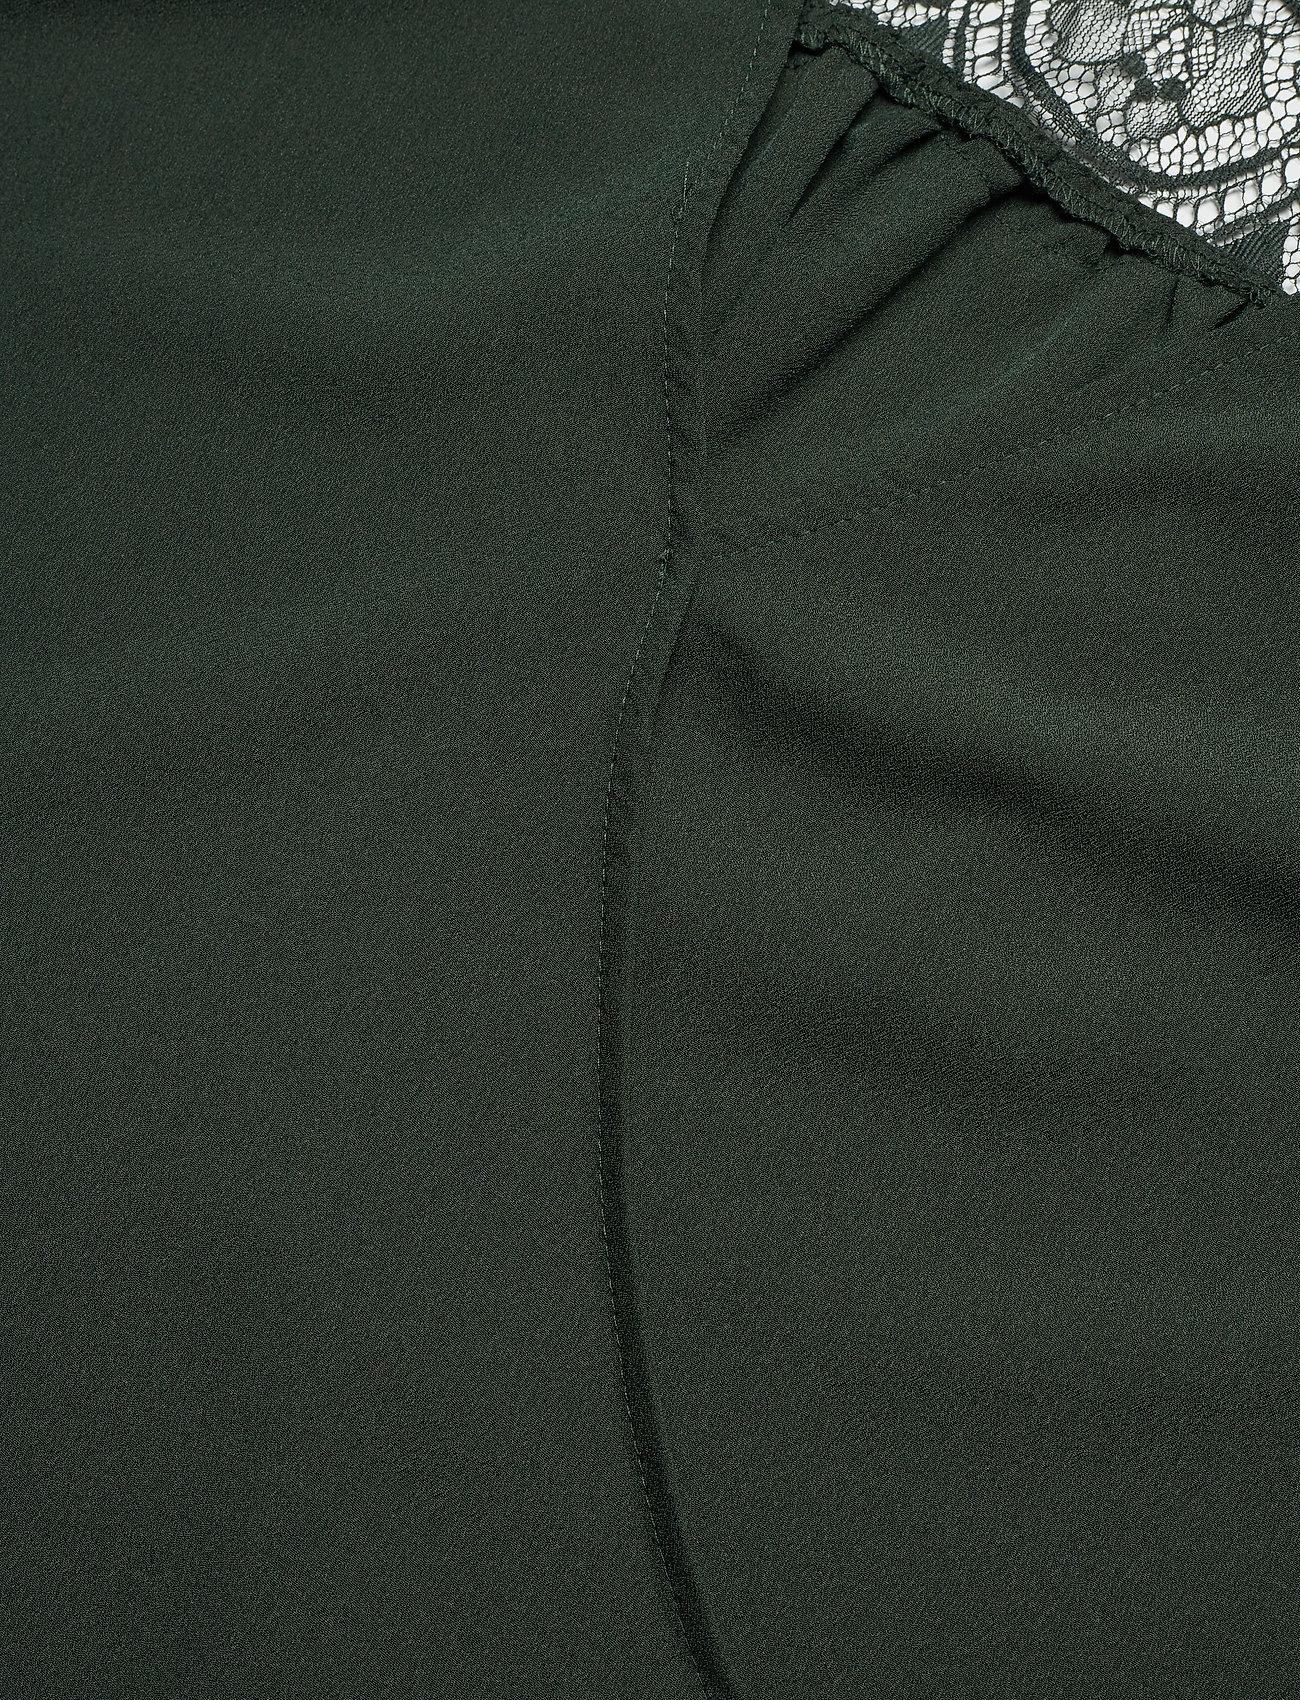 French Connection CREPE LGHT SLD LACE MIX V BACK - Bluzki & Koszule LAUREL - Kobiety Odzież.